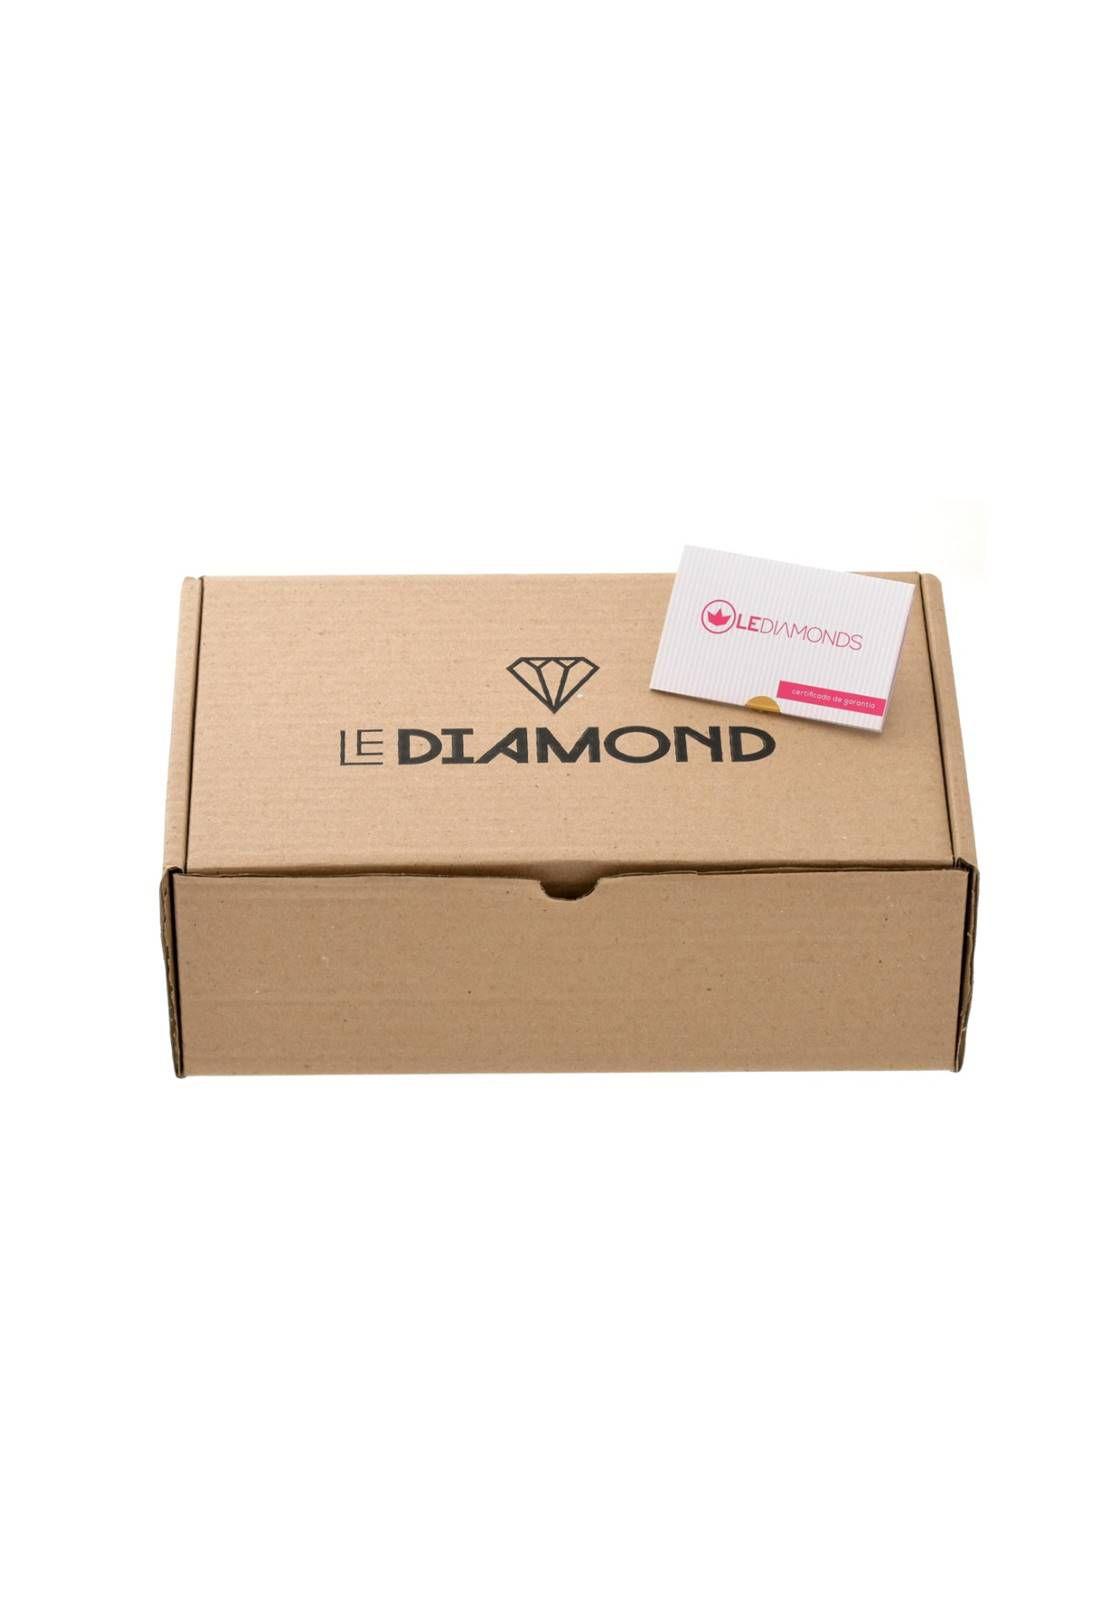 Brinco Le Diamond Carminha Crochê Laranja